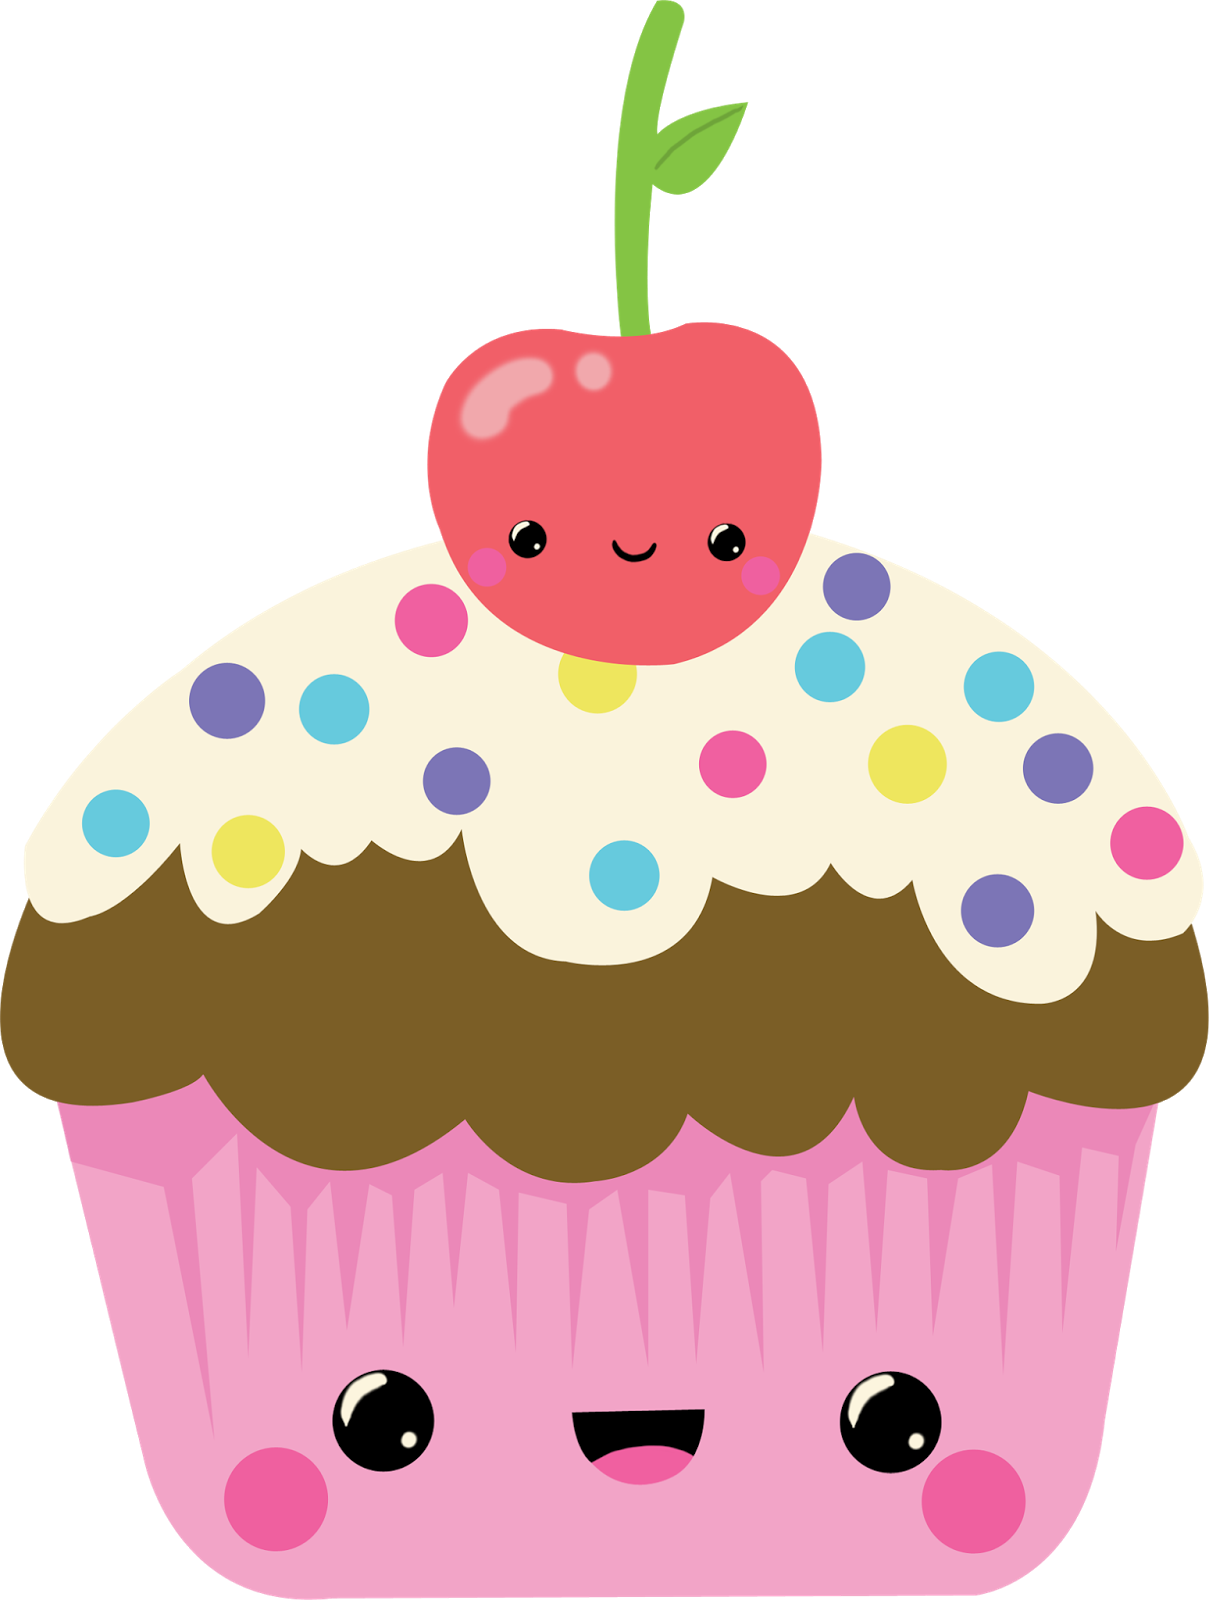 resultado de imagen para cupcakes animados proyectos que minnie mouse clip art minnie mouse clipart head